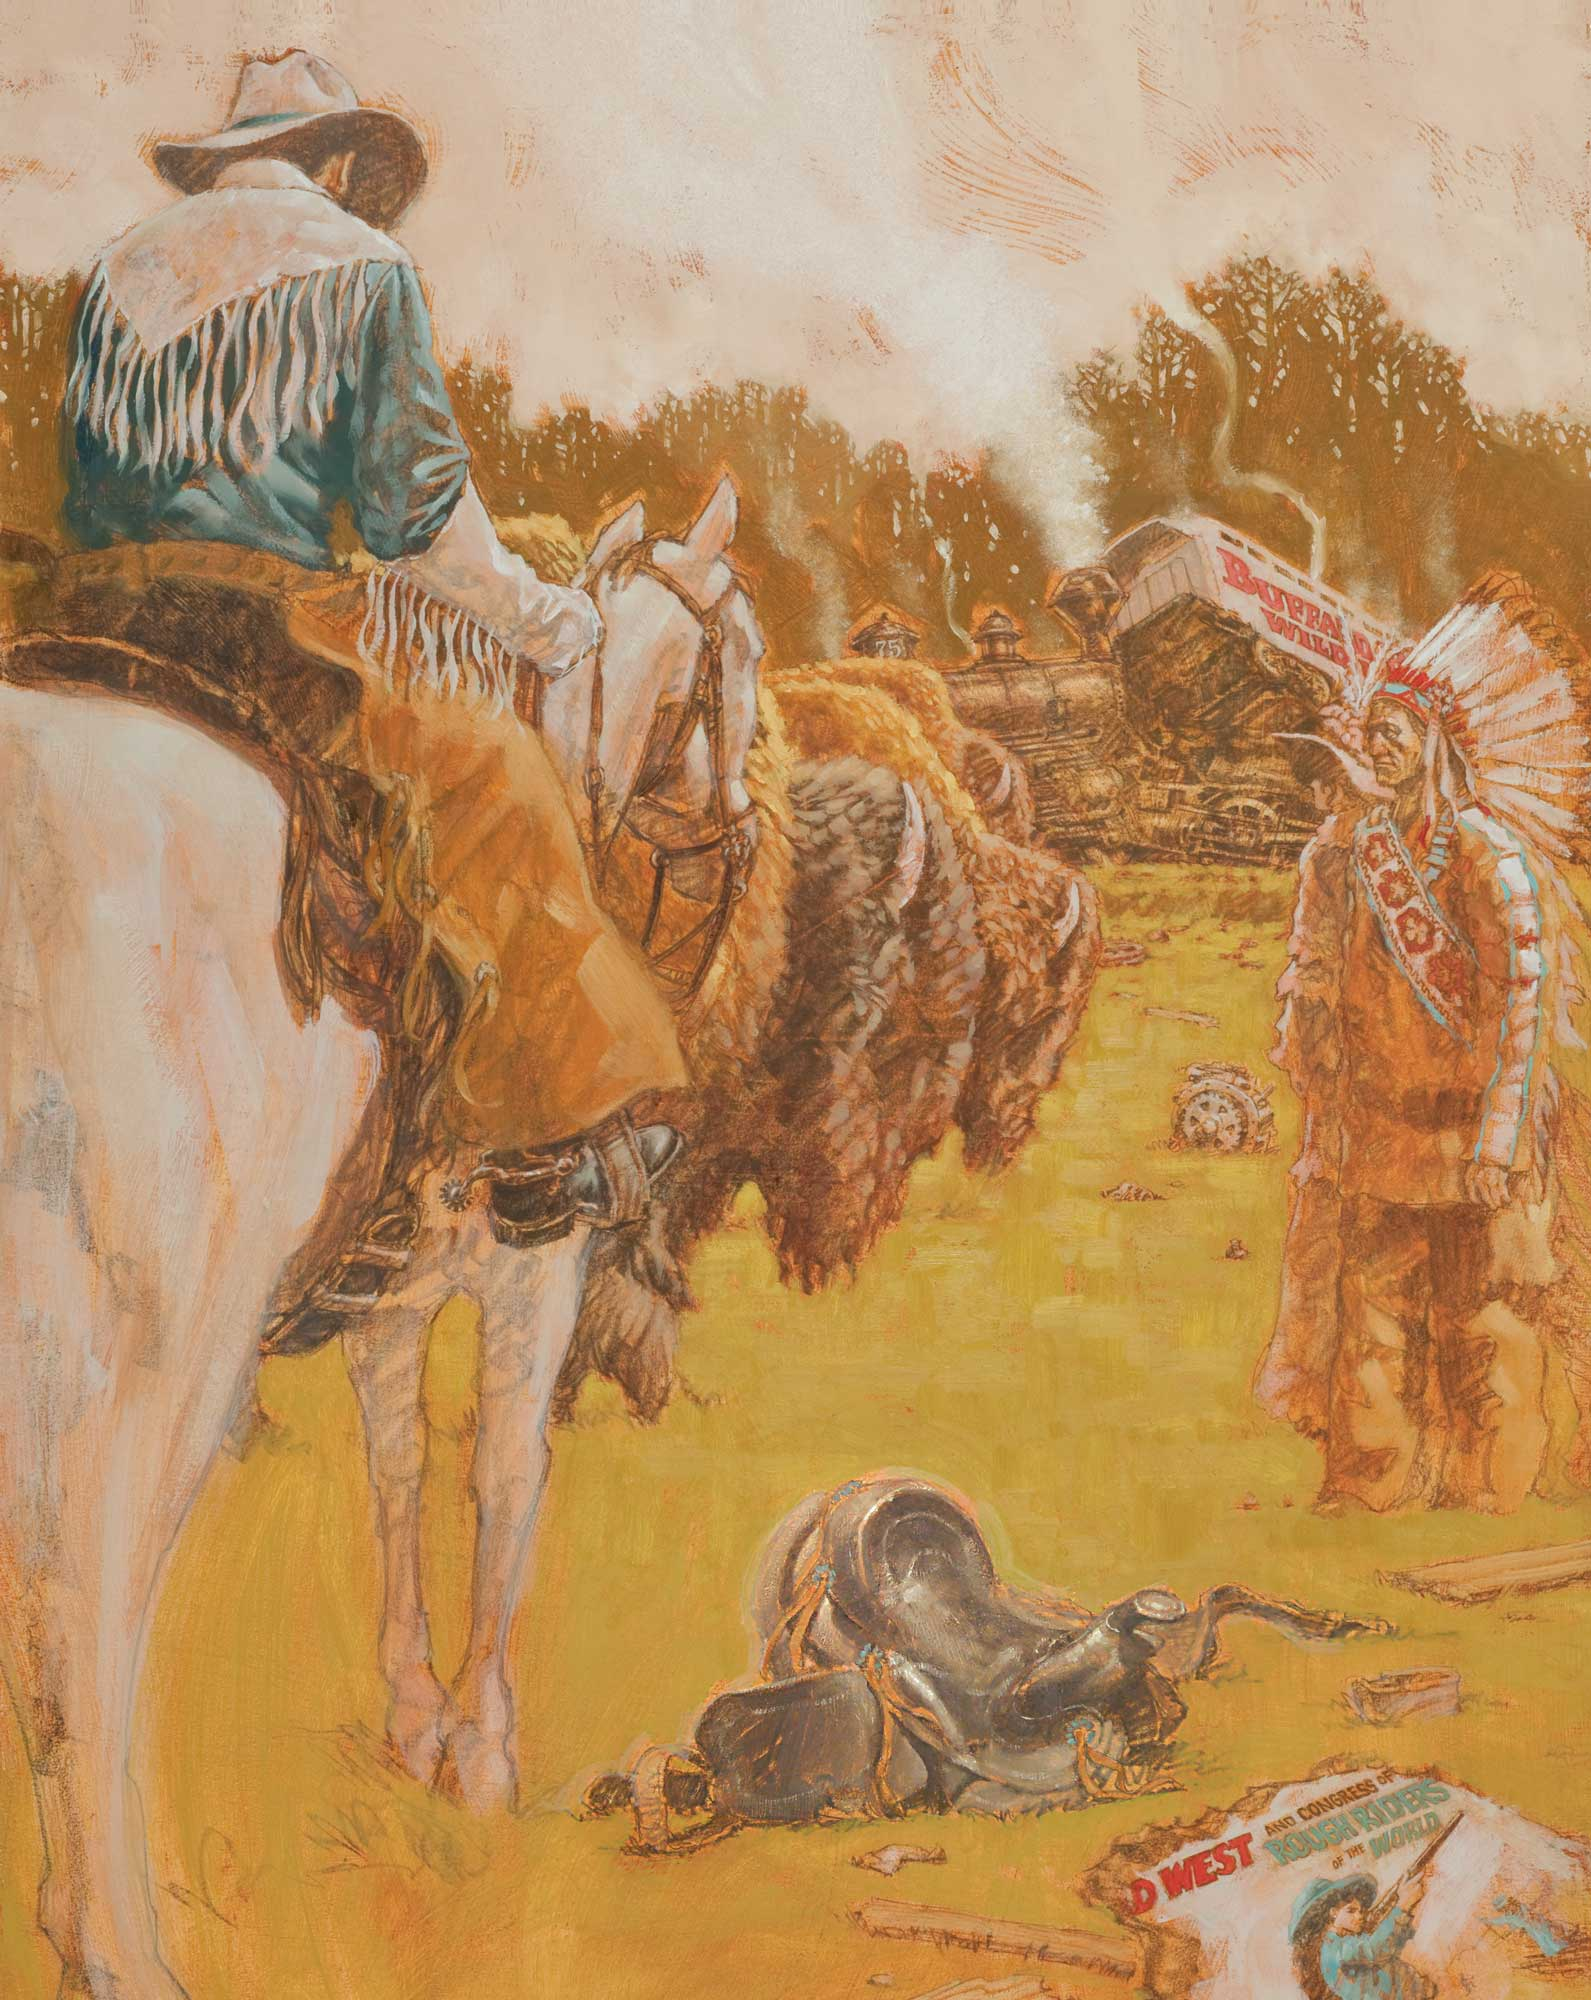 Buffalo Bill Derailed in Davidson County   Our State Magazine